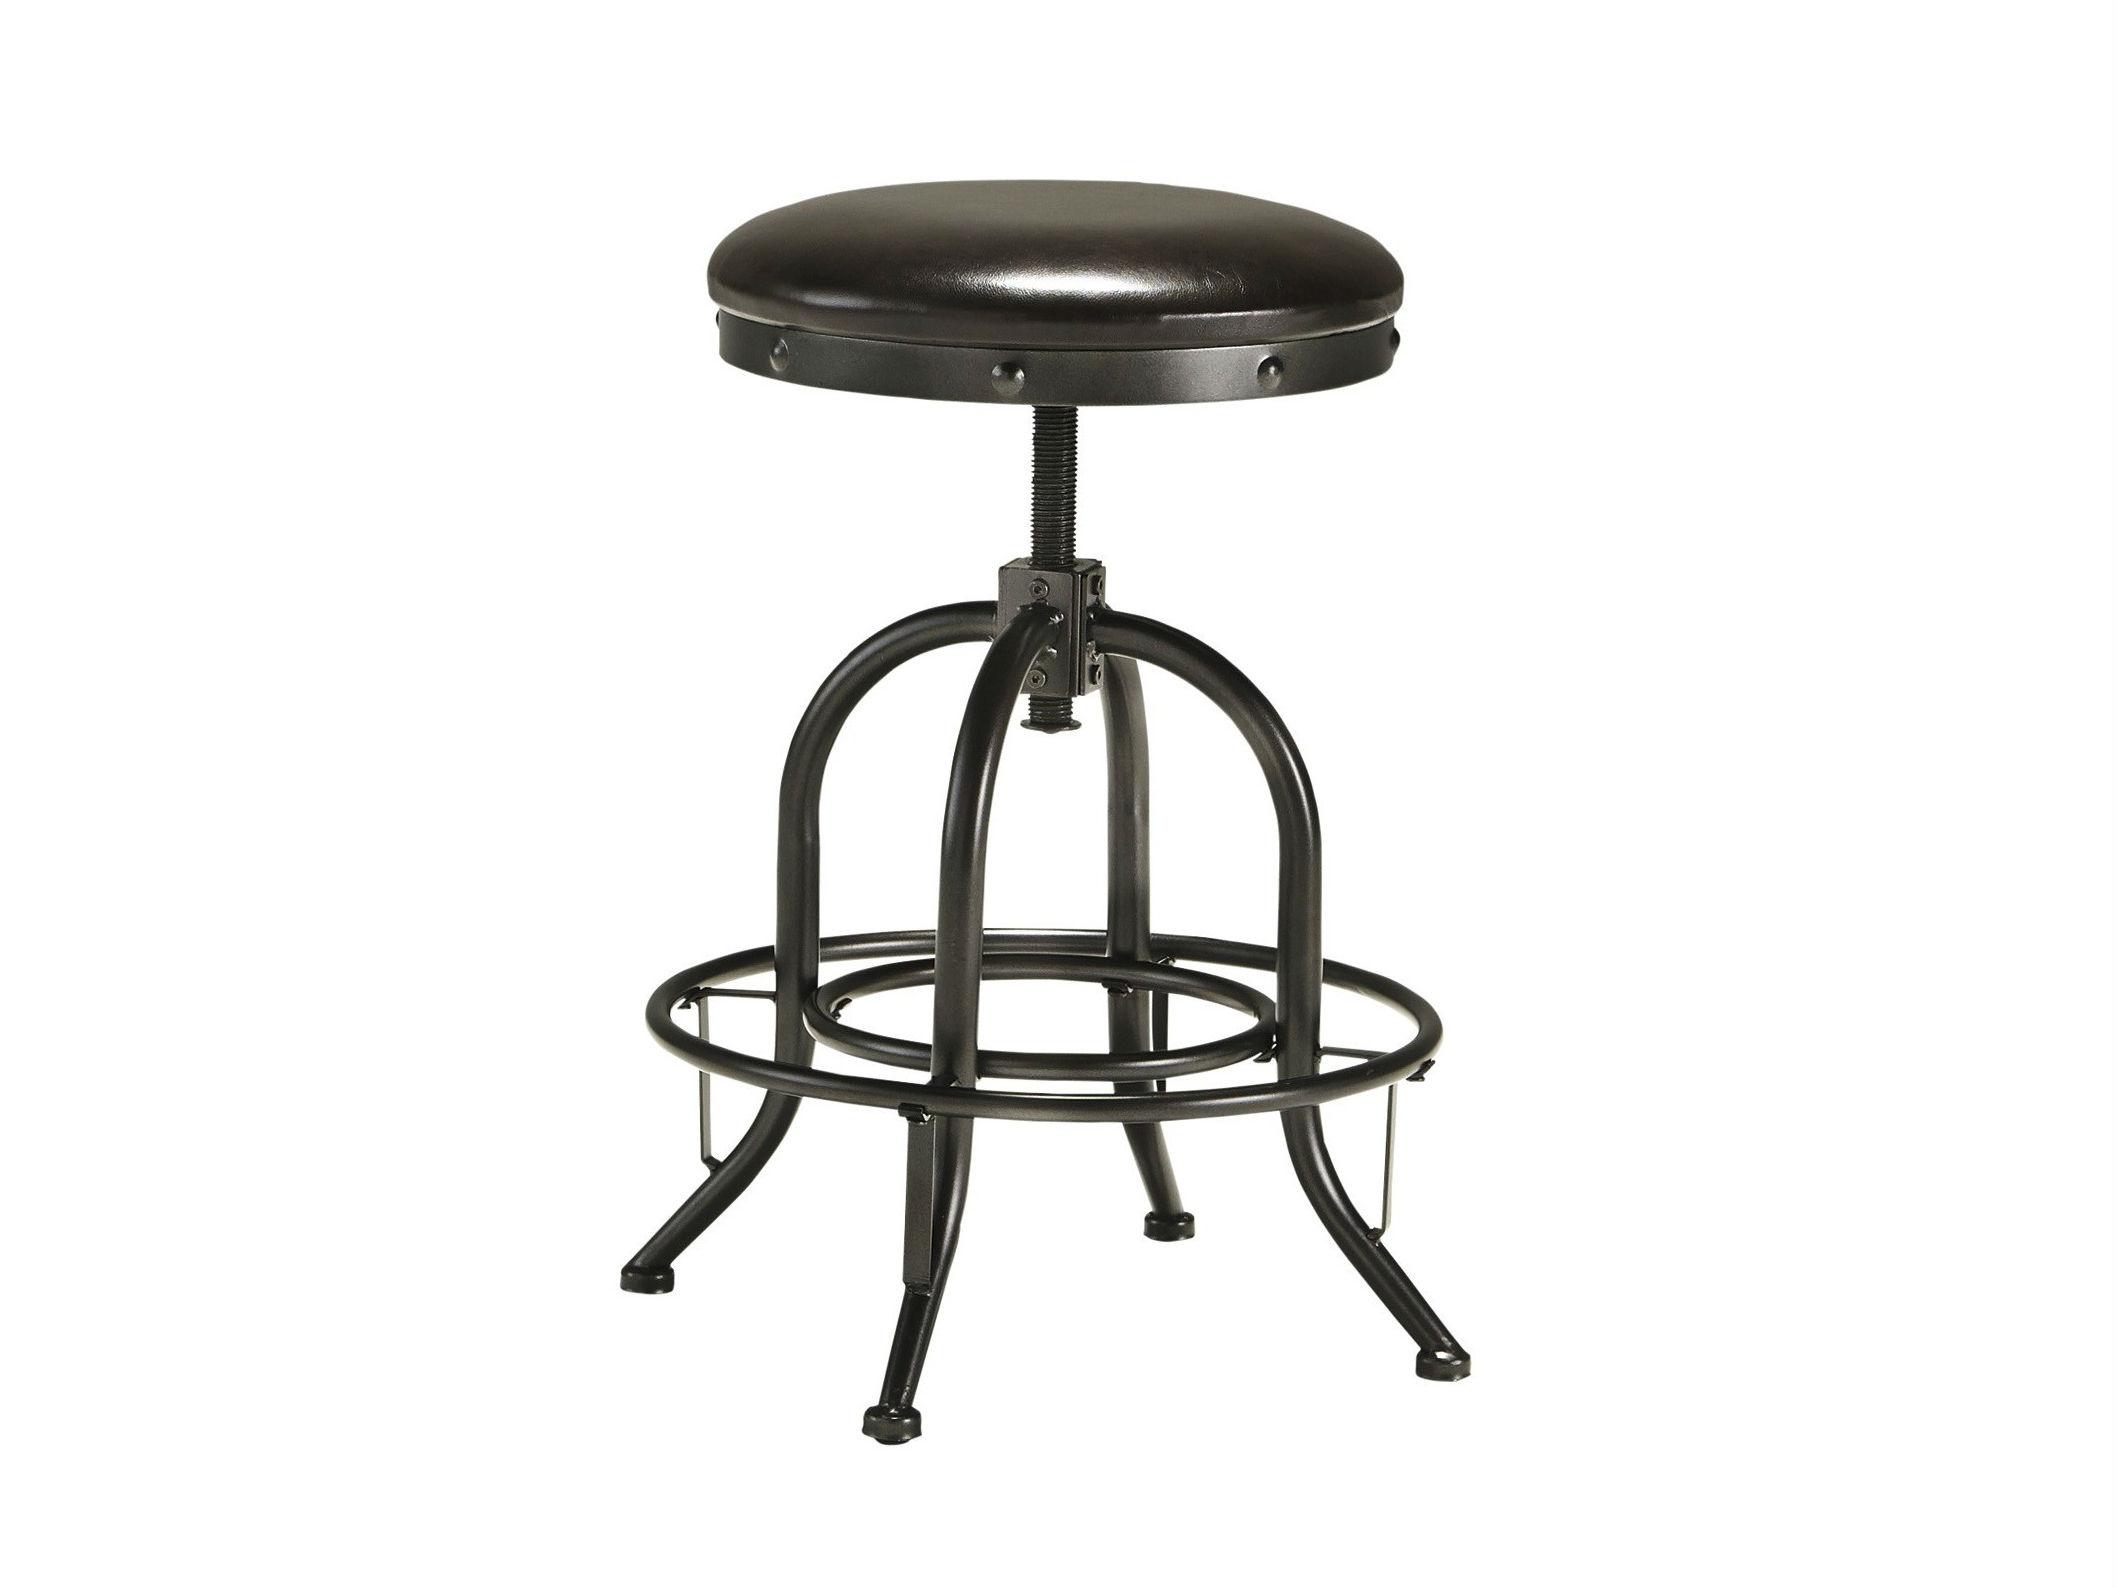 СтулОбеденные стулья<br>Материалы: металл, экокожа<br><br>Material: Металл<br>Height см: 65<br>Diameter см: 44